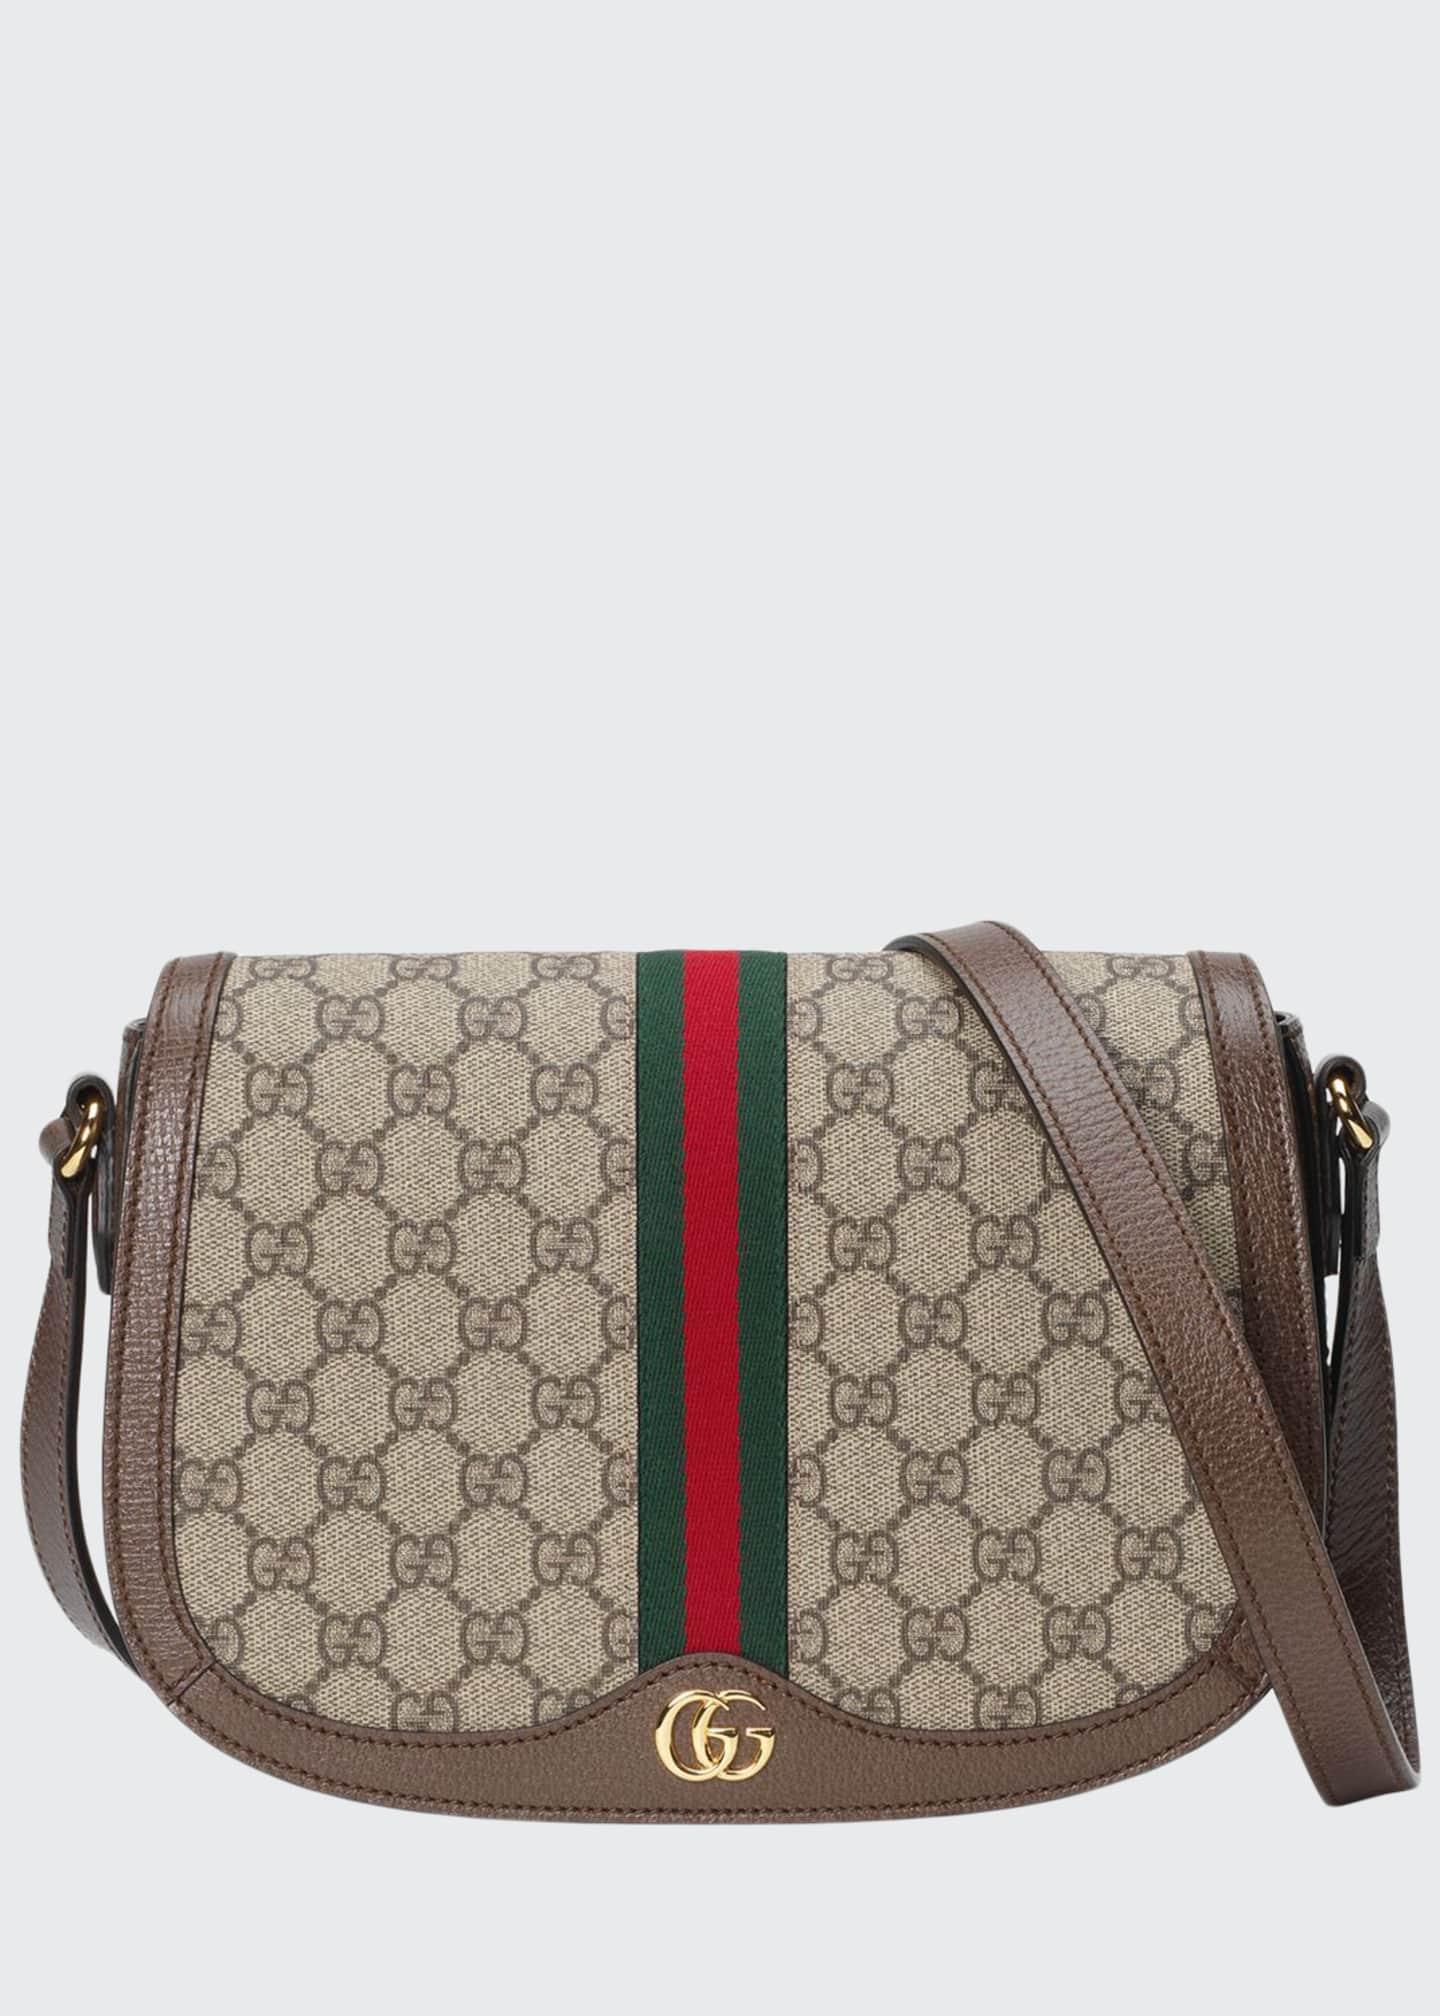 Gucci Ophidia Small GG Supreme Flap Messenger Bag